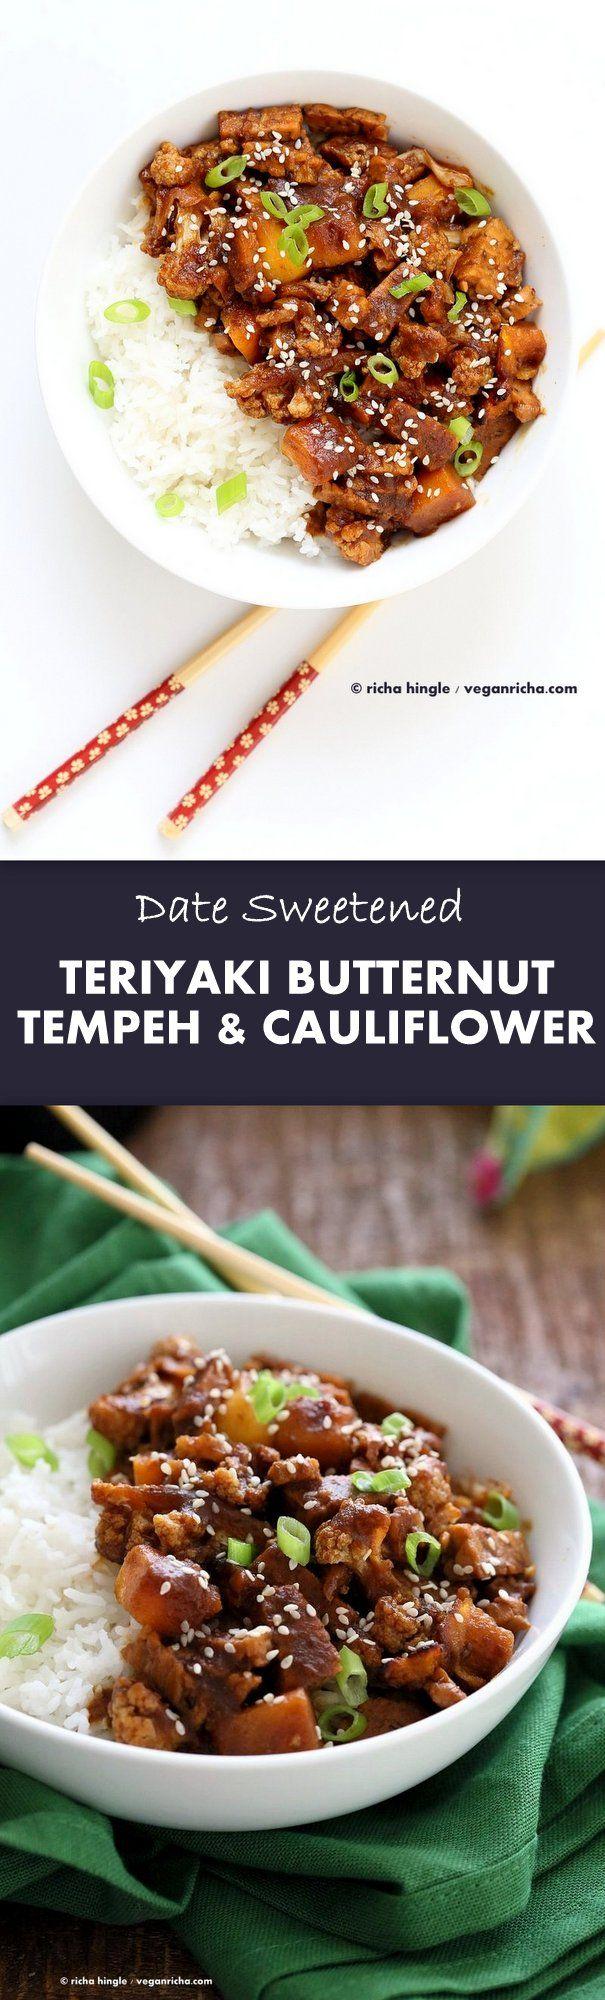 Tempeh Cauliflower Butternut in Teriyaki Sauce. This teriyaki sauce is date sweetened and works amazingly with butternut squash and vegetables. Vegan Gluten-free Recipe VeganRicha.com